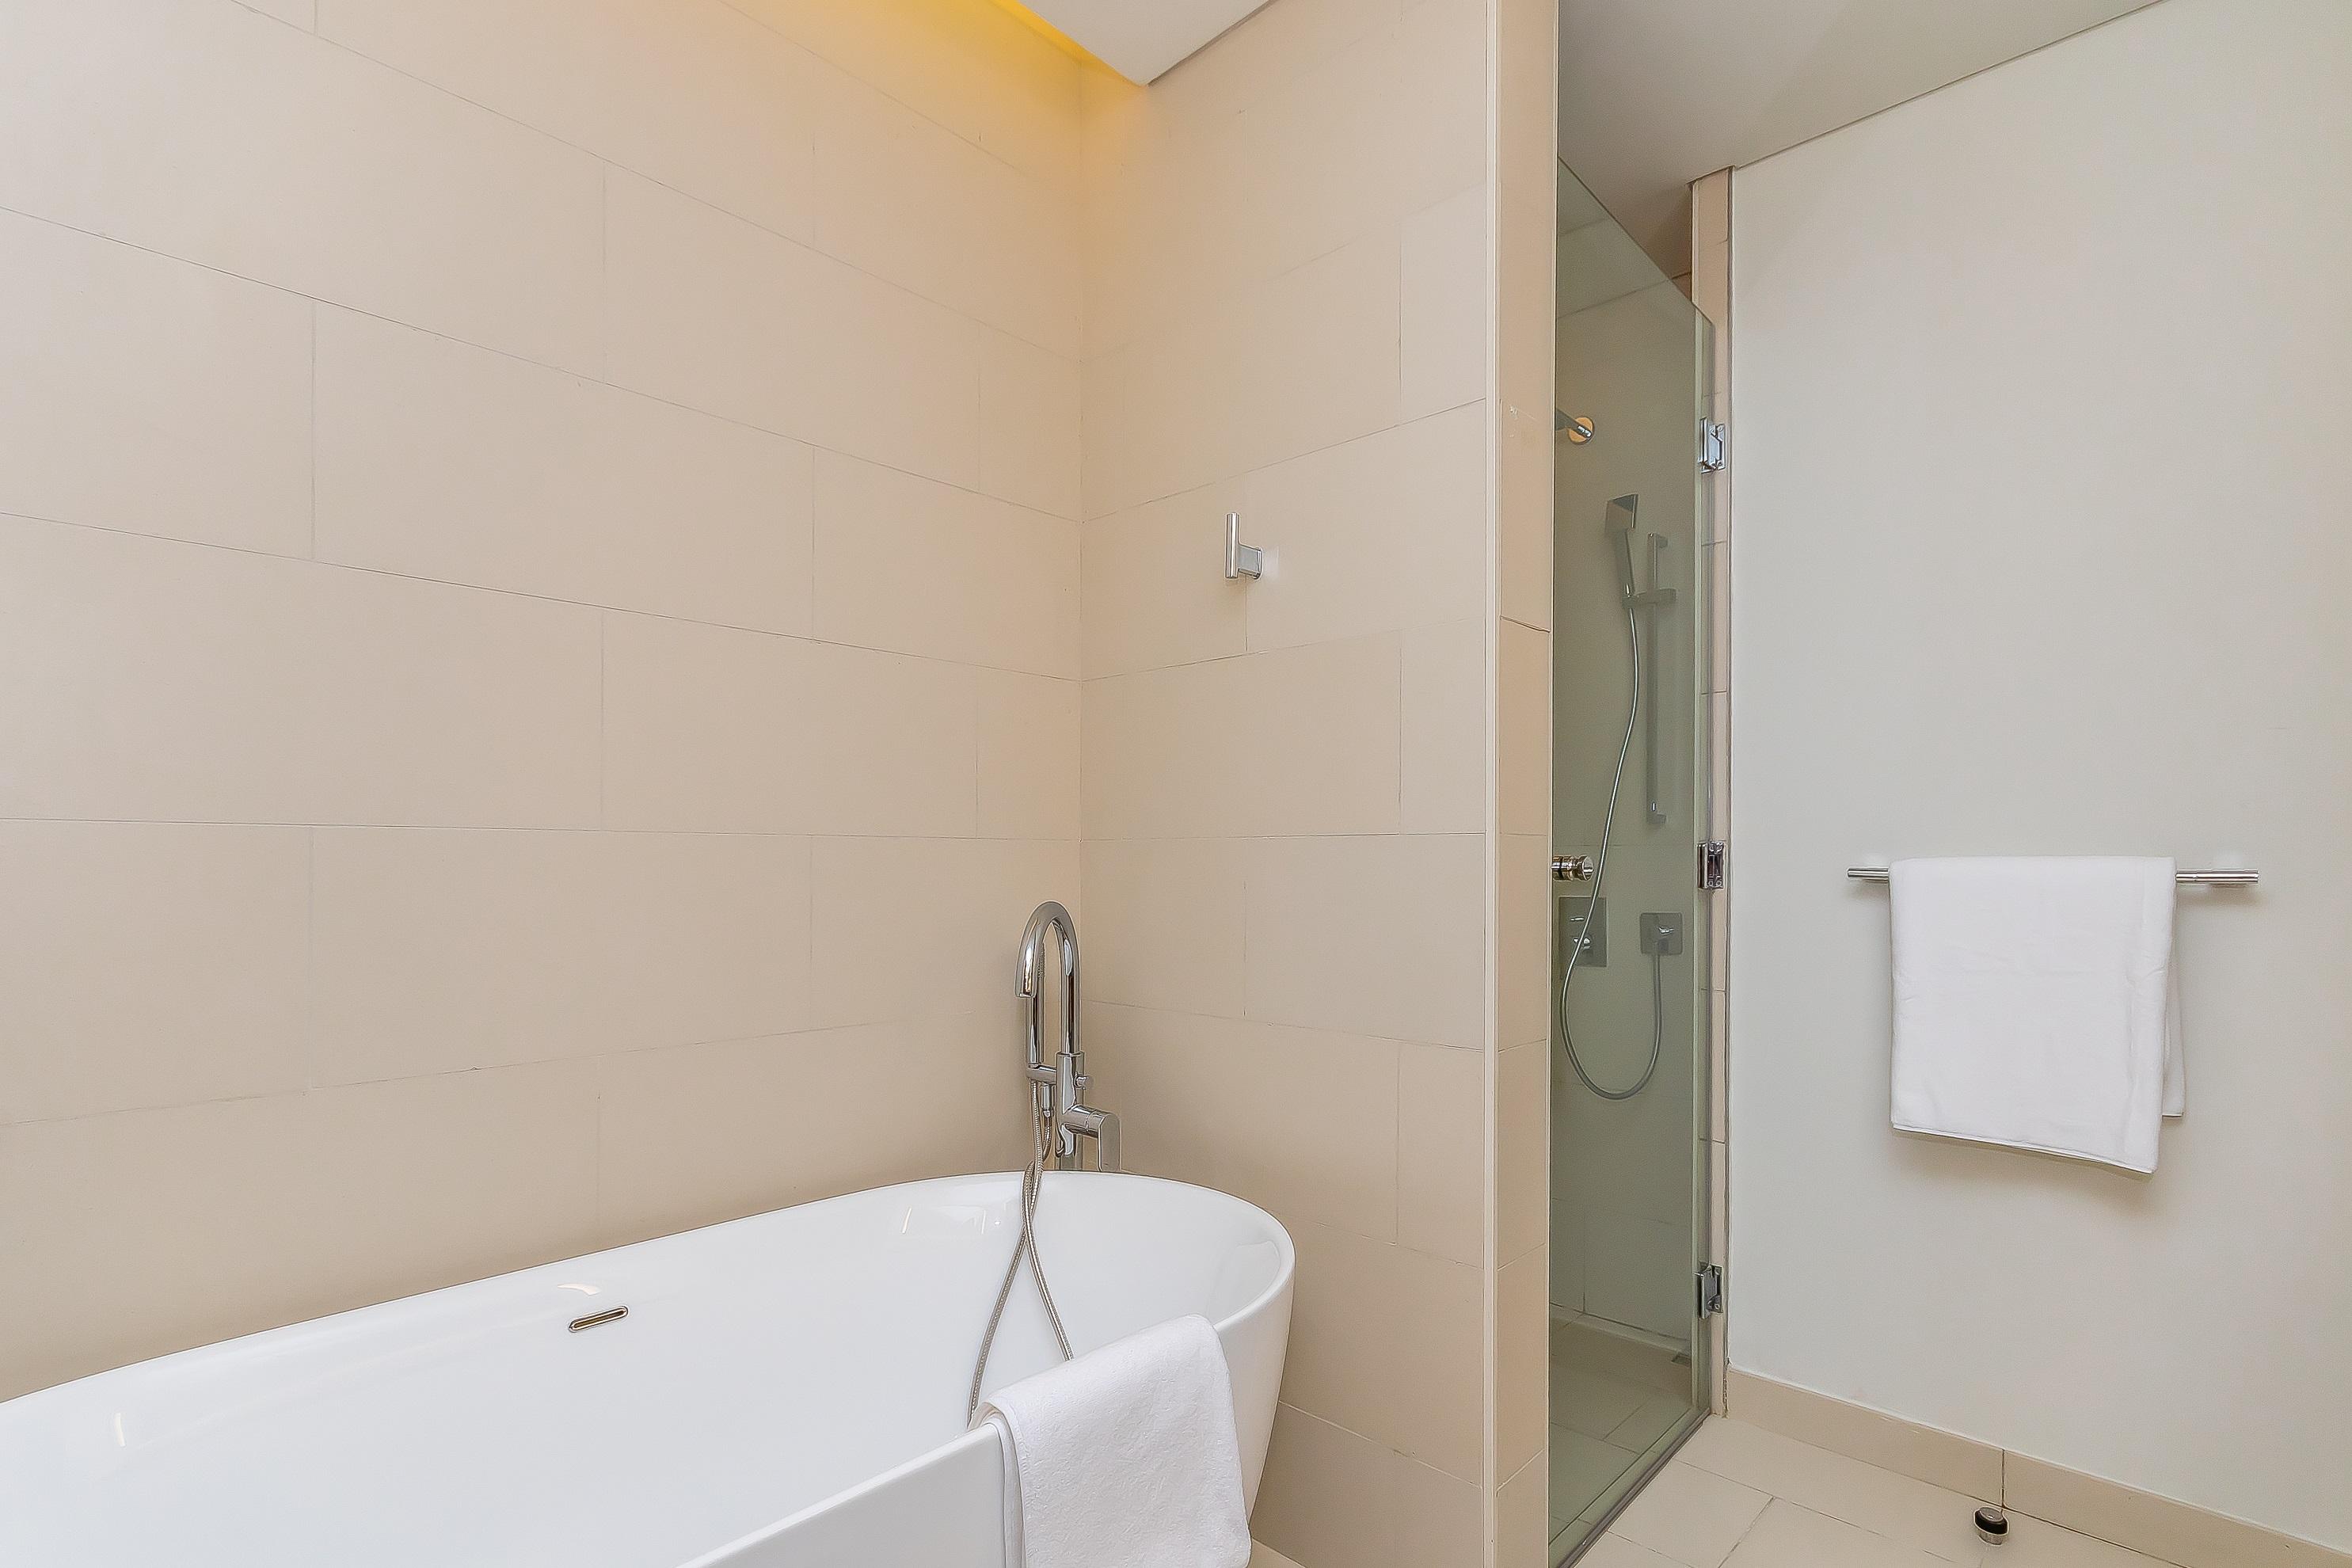 Apartment  Remarkable Value   Unbeatable Location  3 Beds City Walk B 10 309 photo 24142311